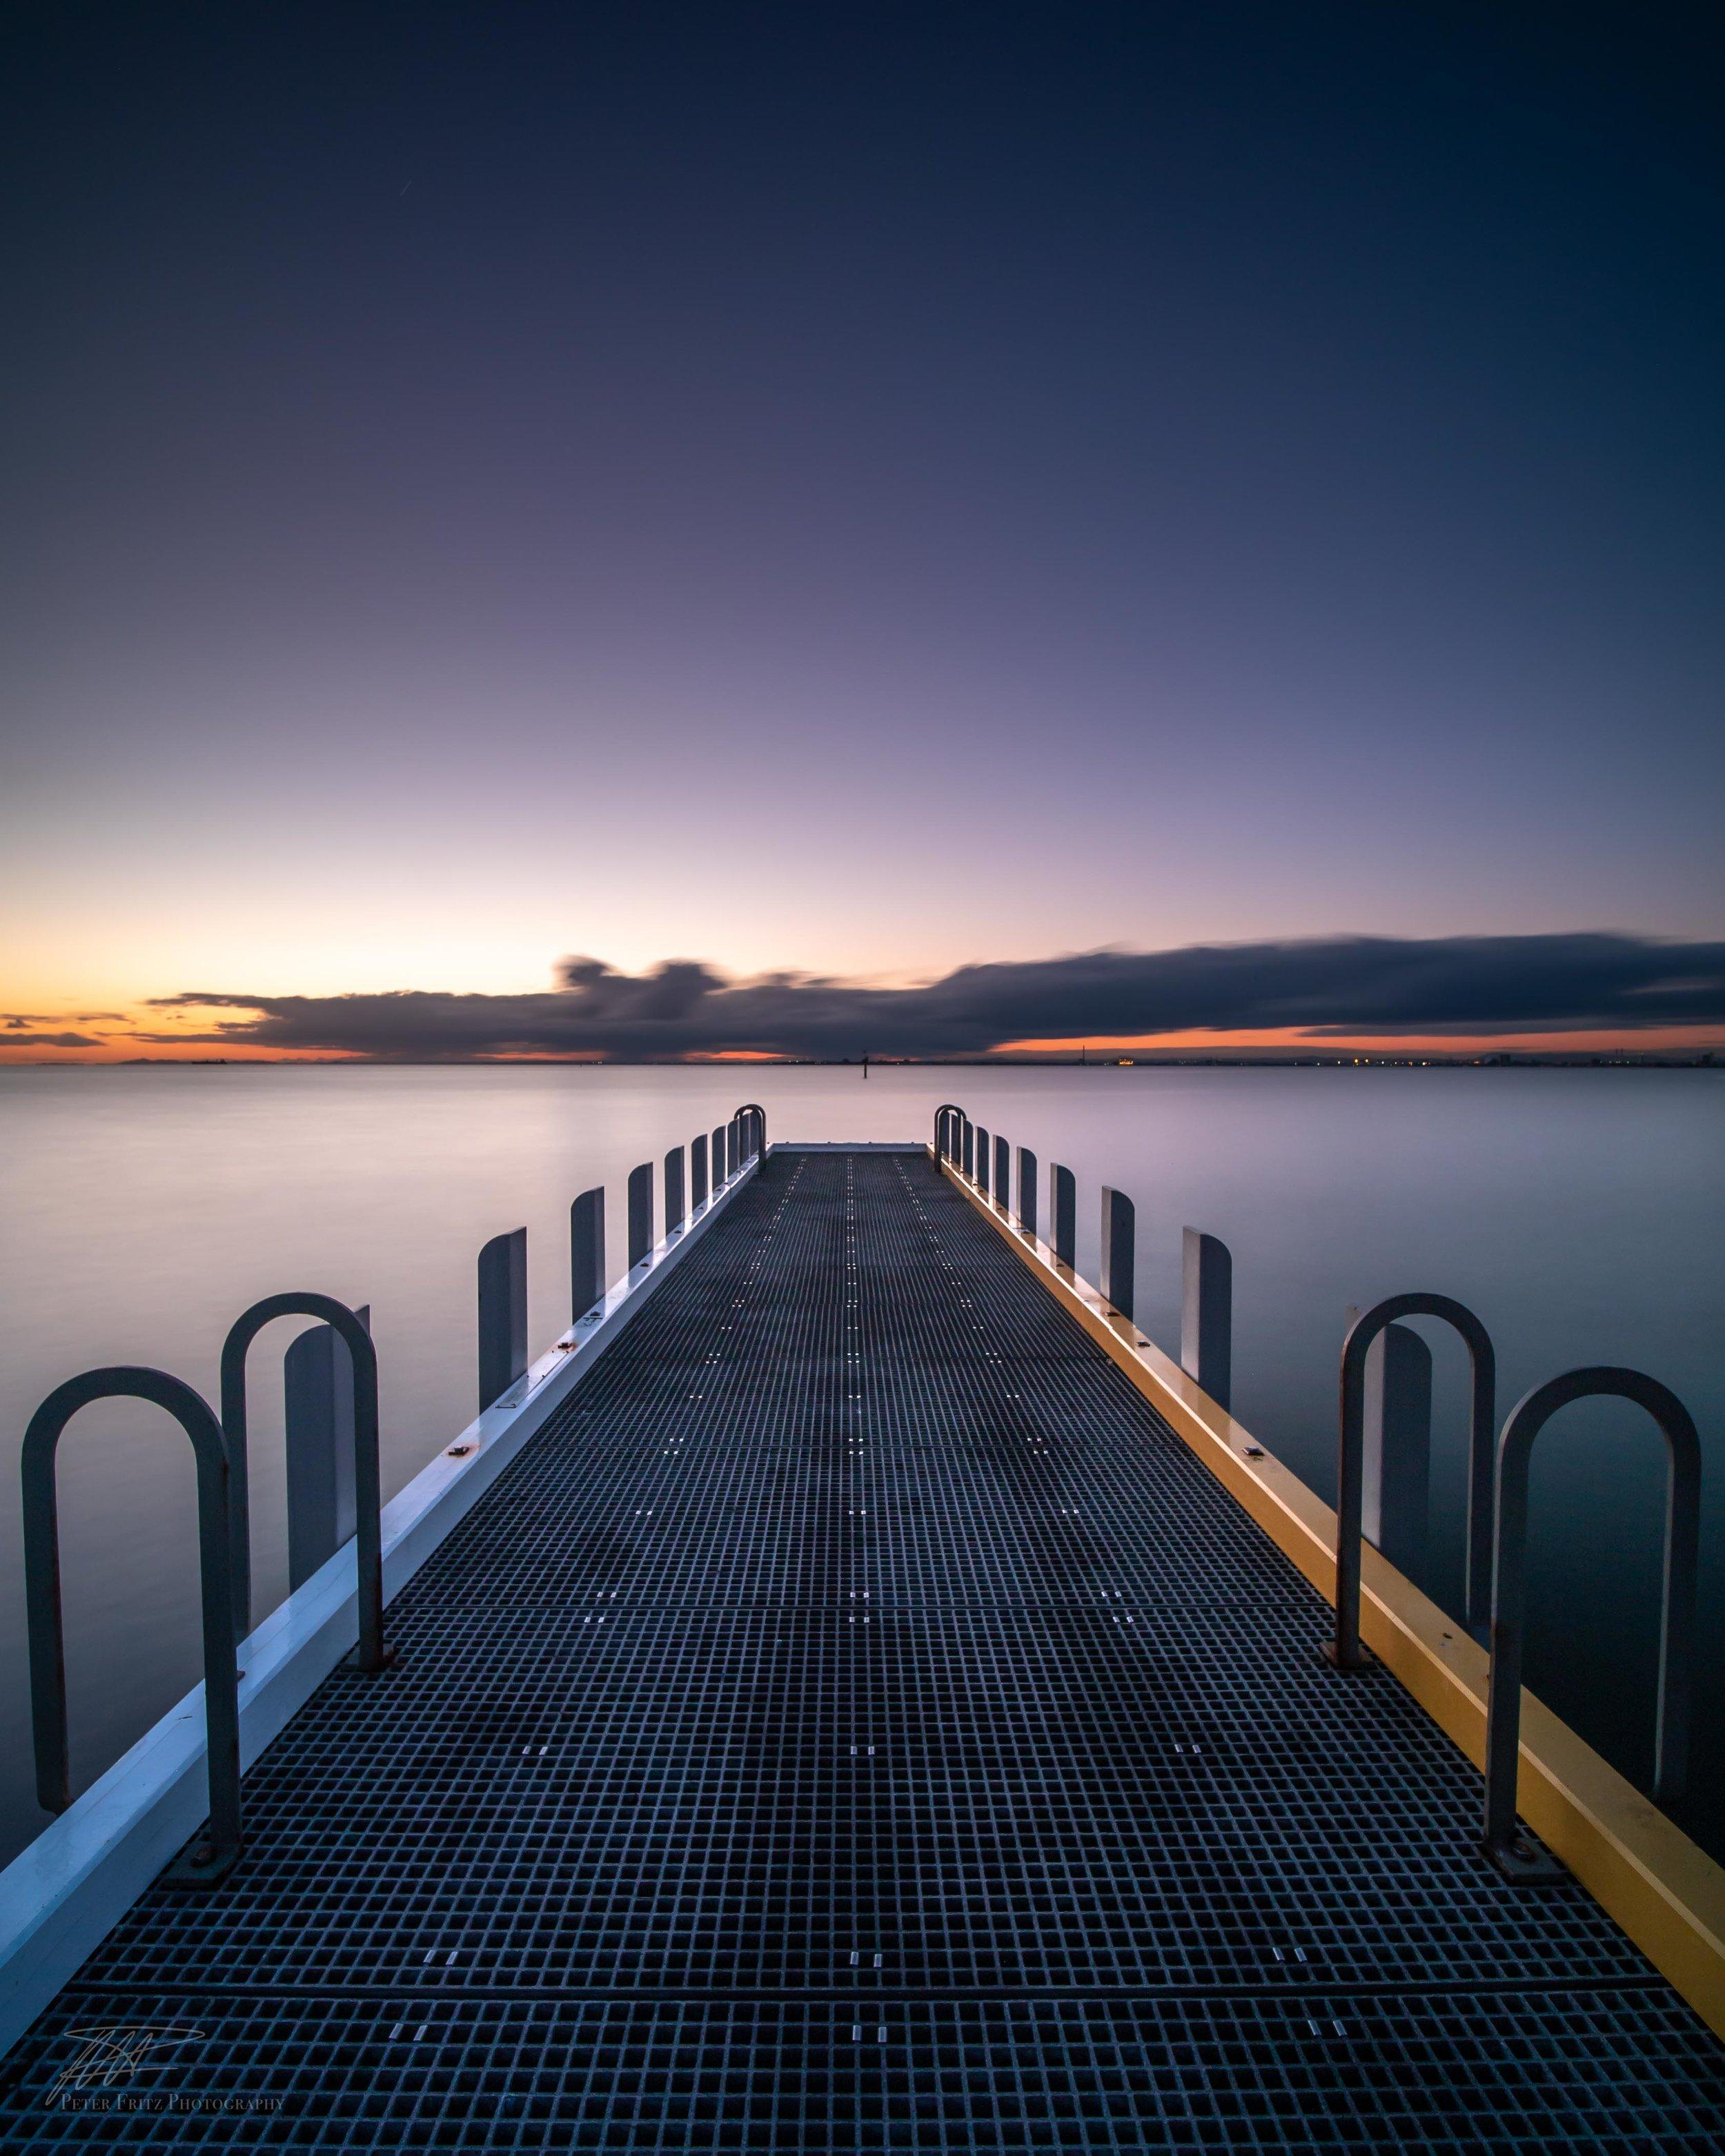 Elwood jetty web 4x3 colour.jpg